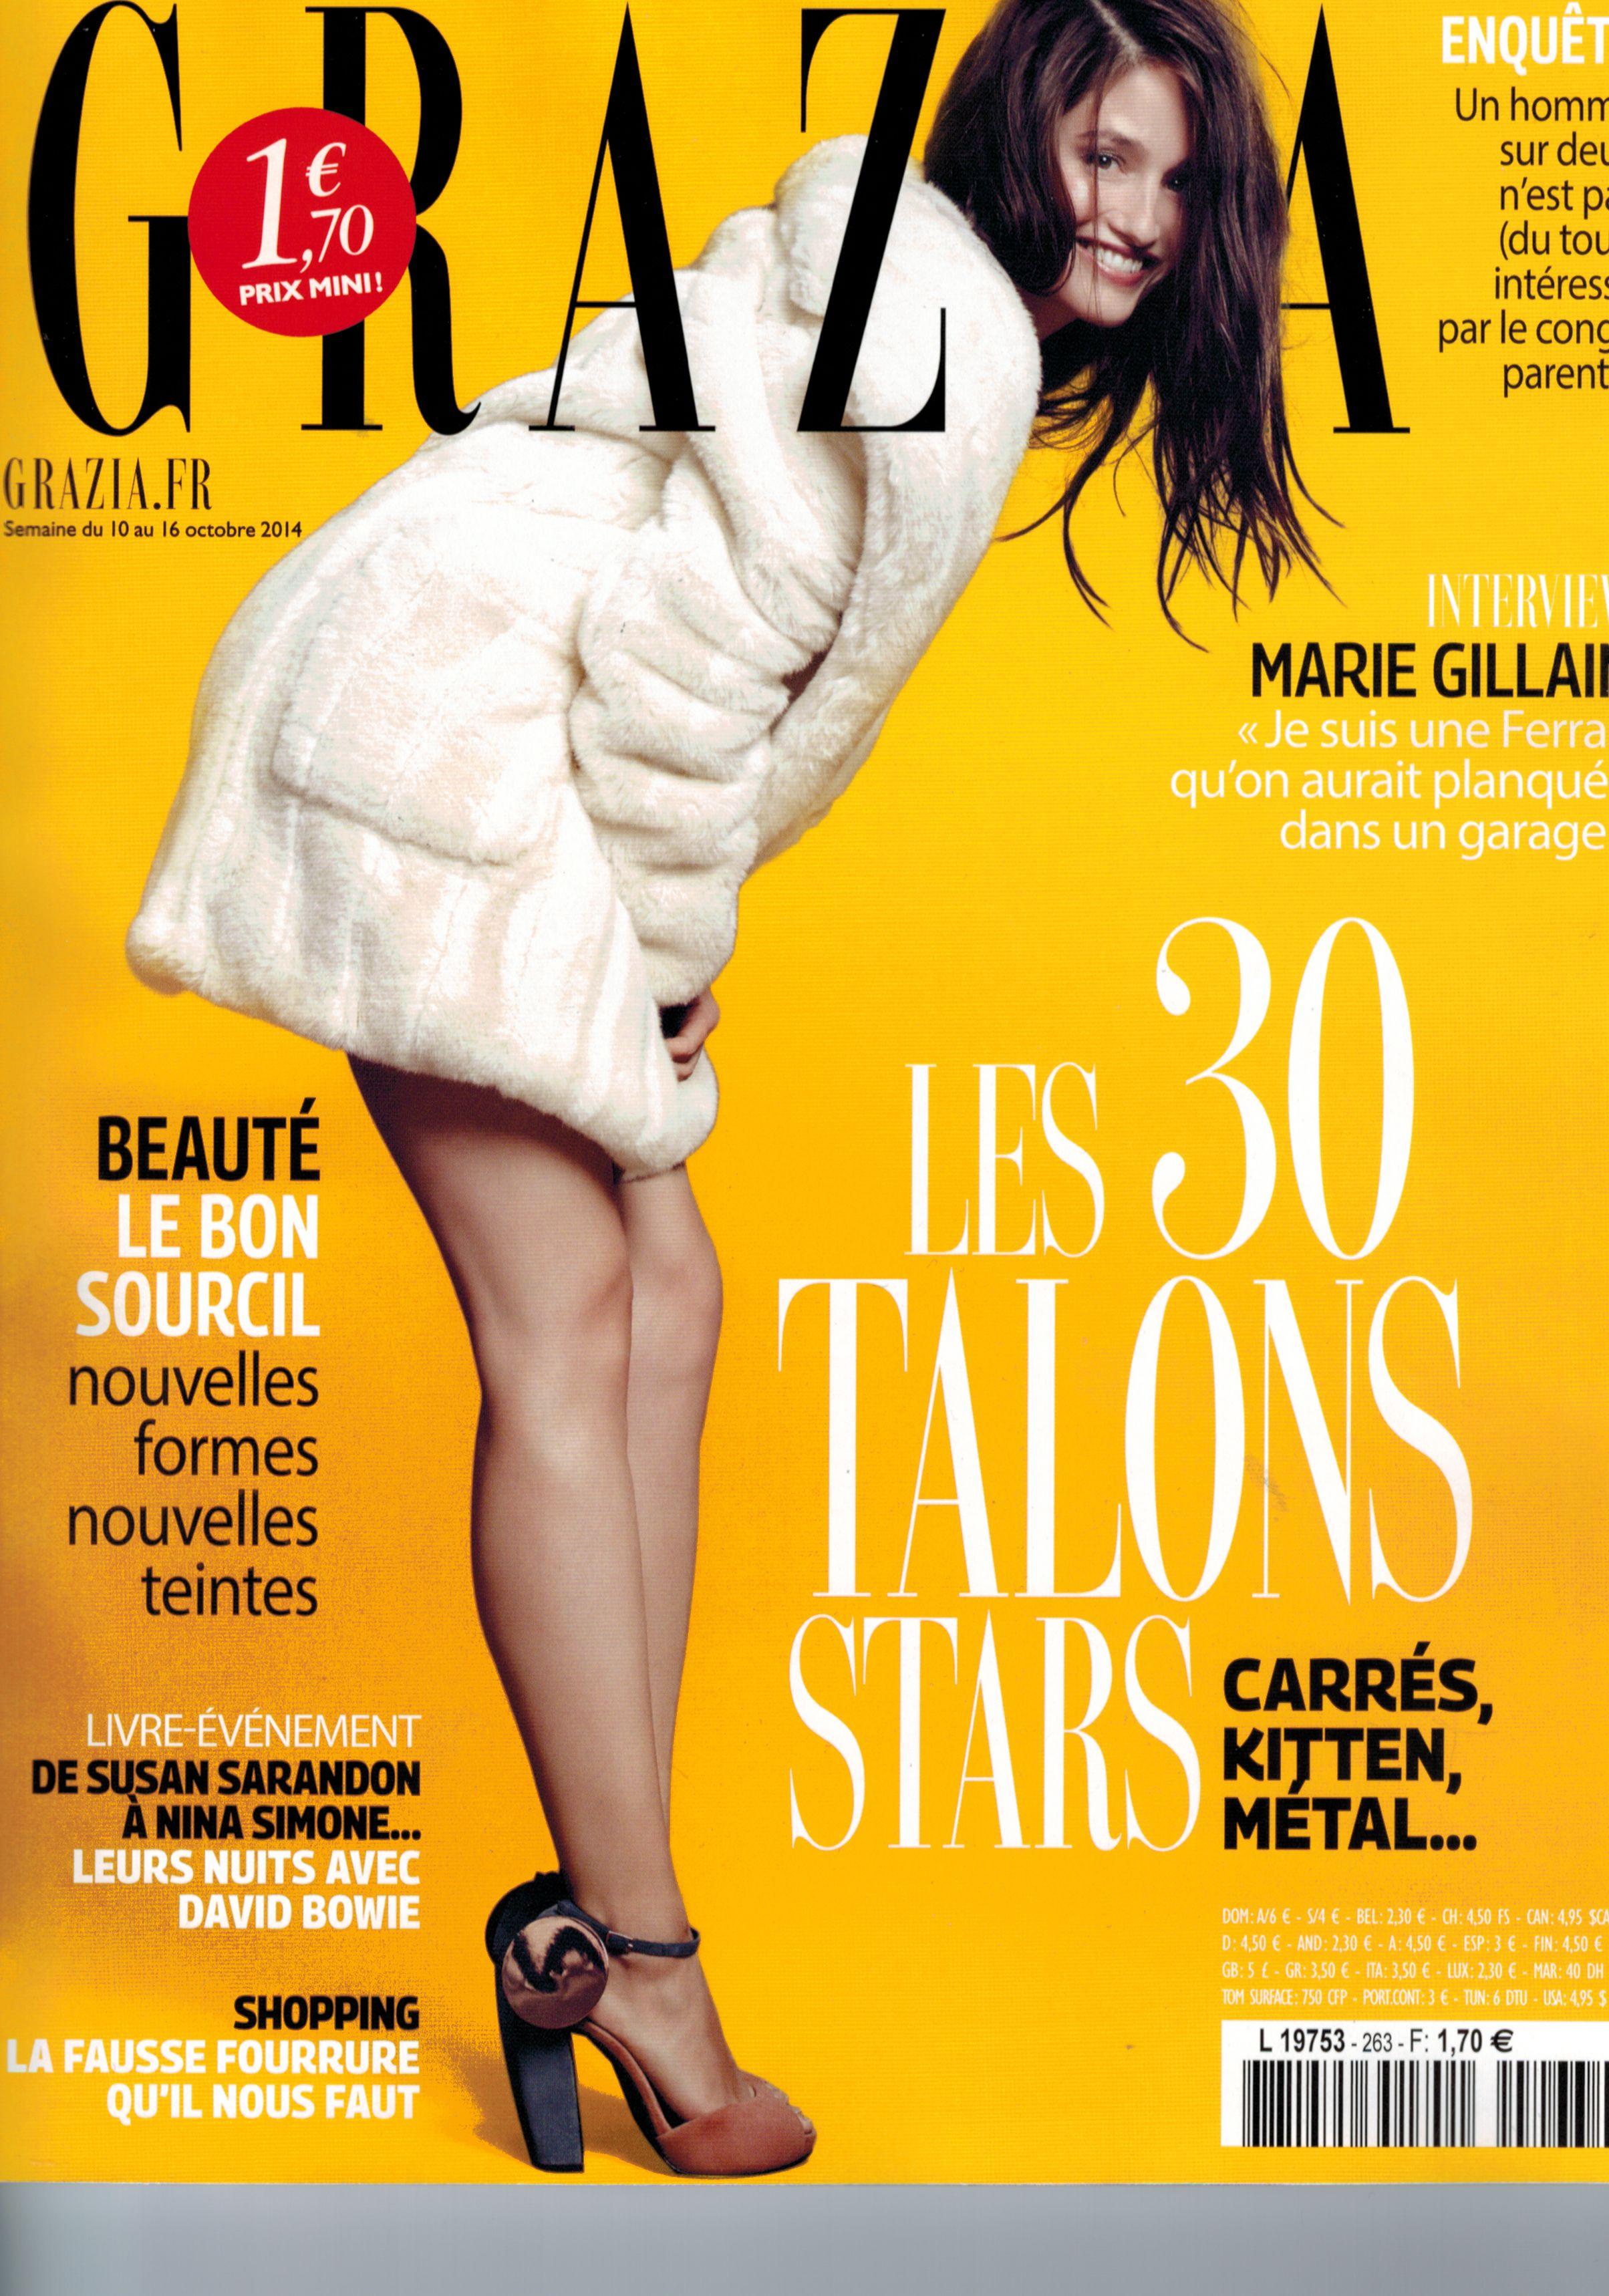 GRAZIA magazine 10.10.14